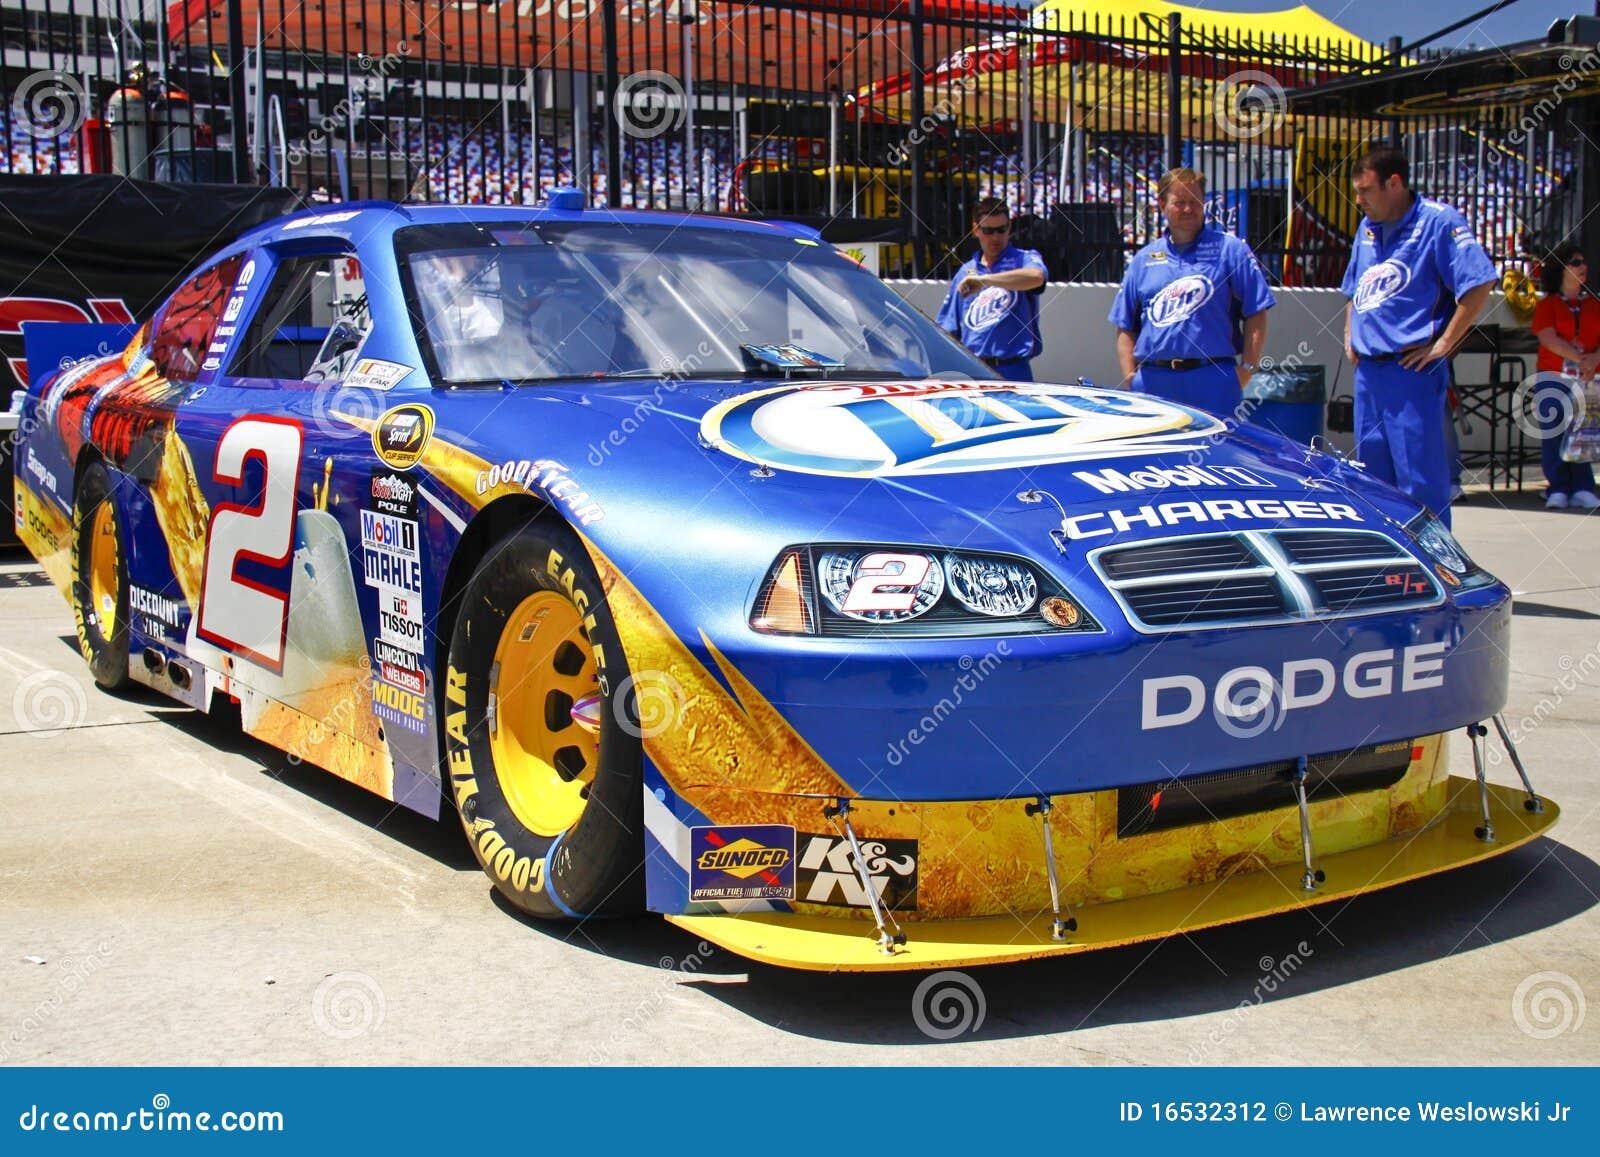 NASCAR - Coca Cola 600 winning car - Kurt Busch #2